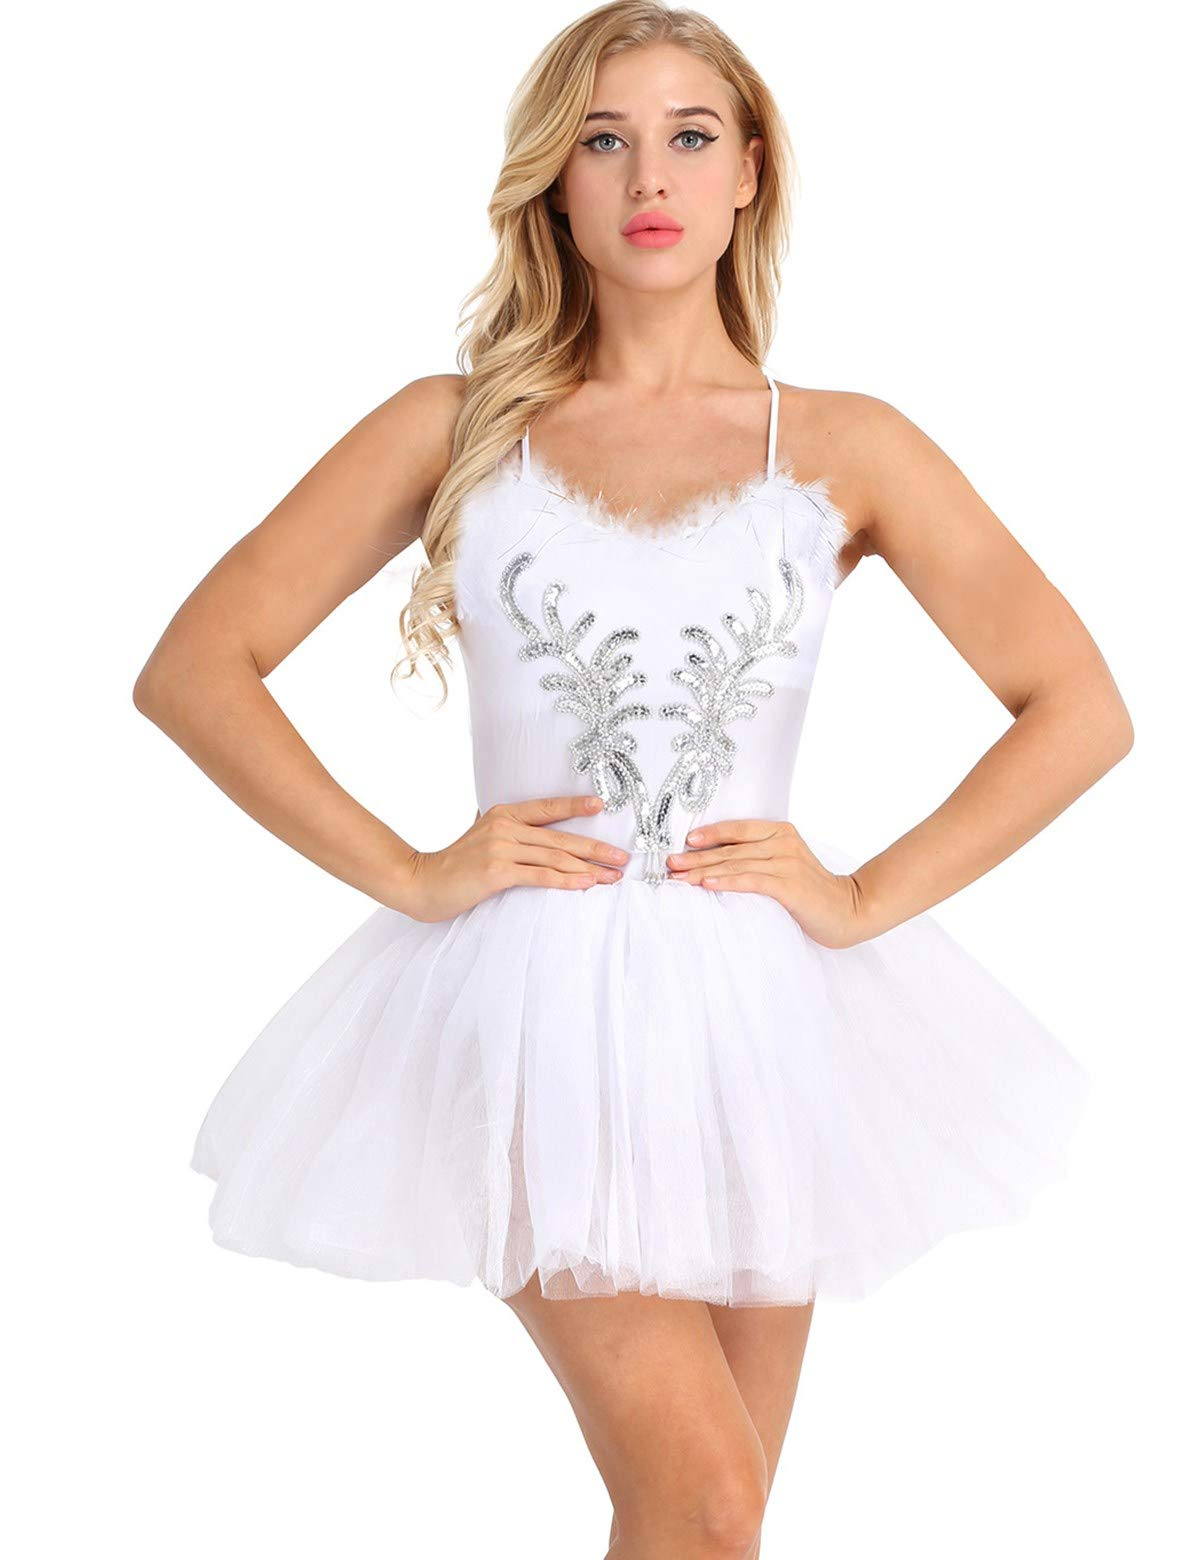 iiniim Women's Ballet Tutu Costume Black Swan Lake Dance Leotard Dress White Style B S by iiniim